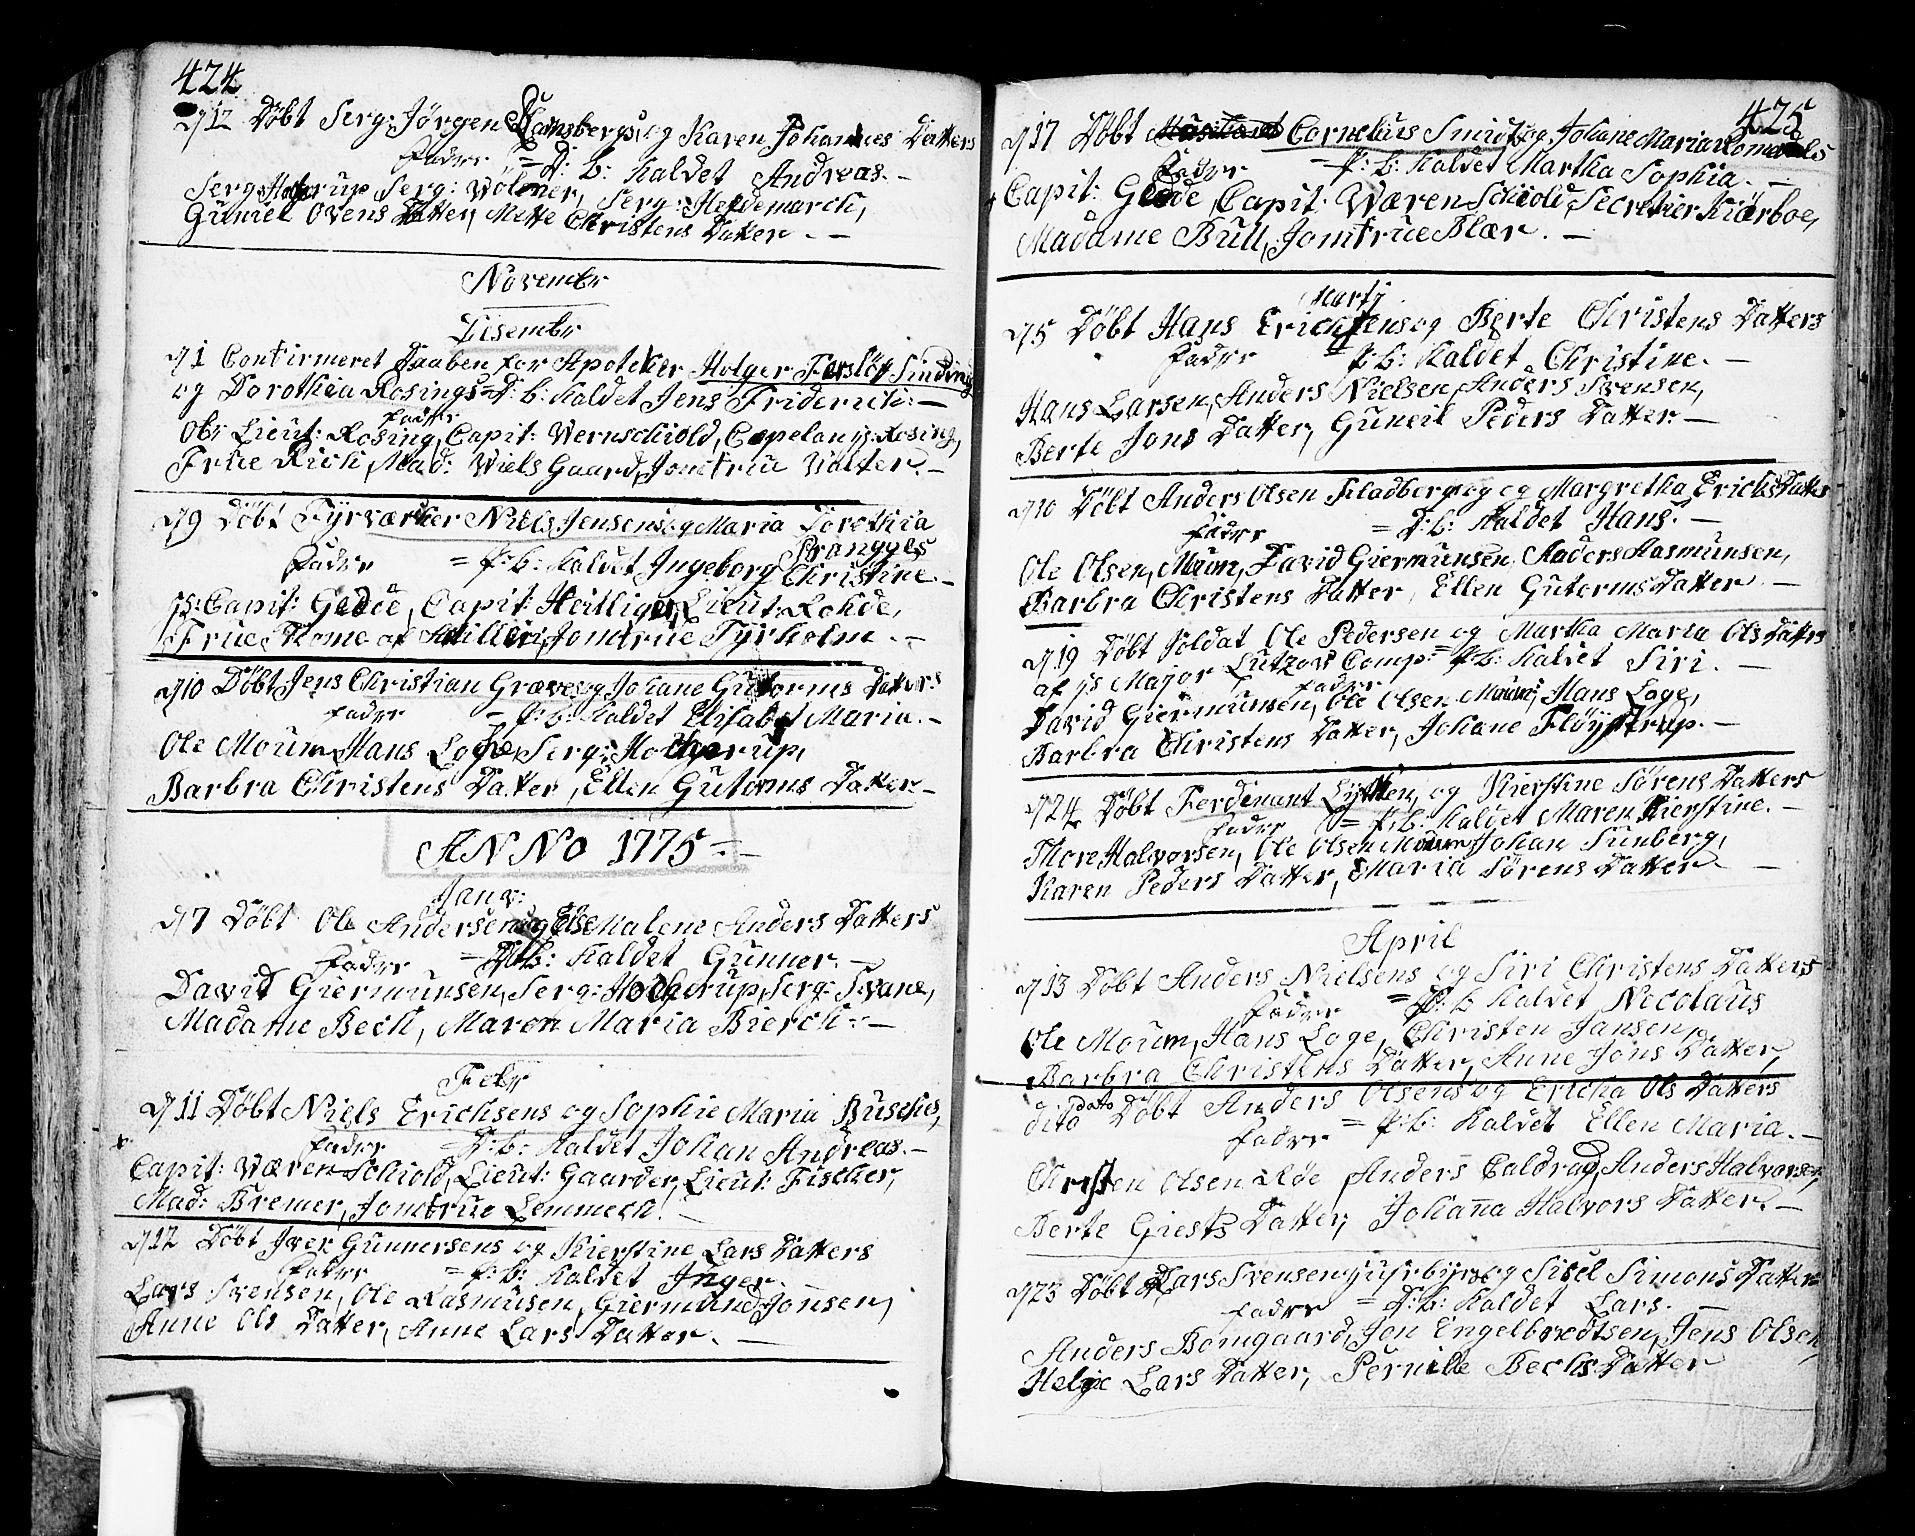 SAO, Fredrikstad prestekontor Kirkebøker, F/Fa/L0002: Ministerialbok nr. 2, 1750-1804, s. 424-425